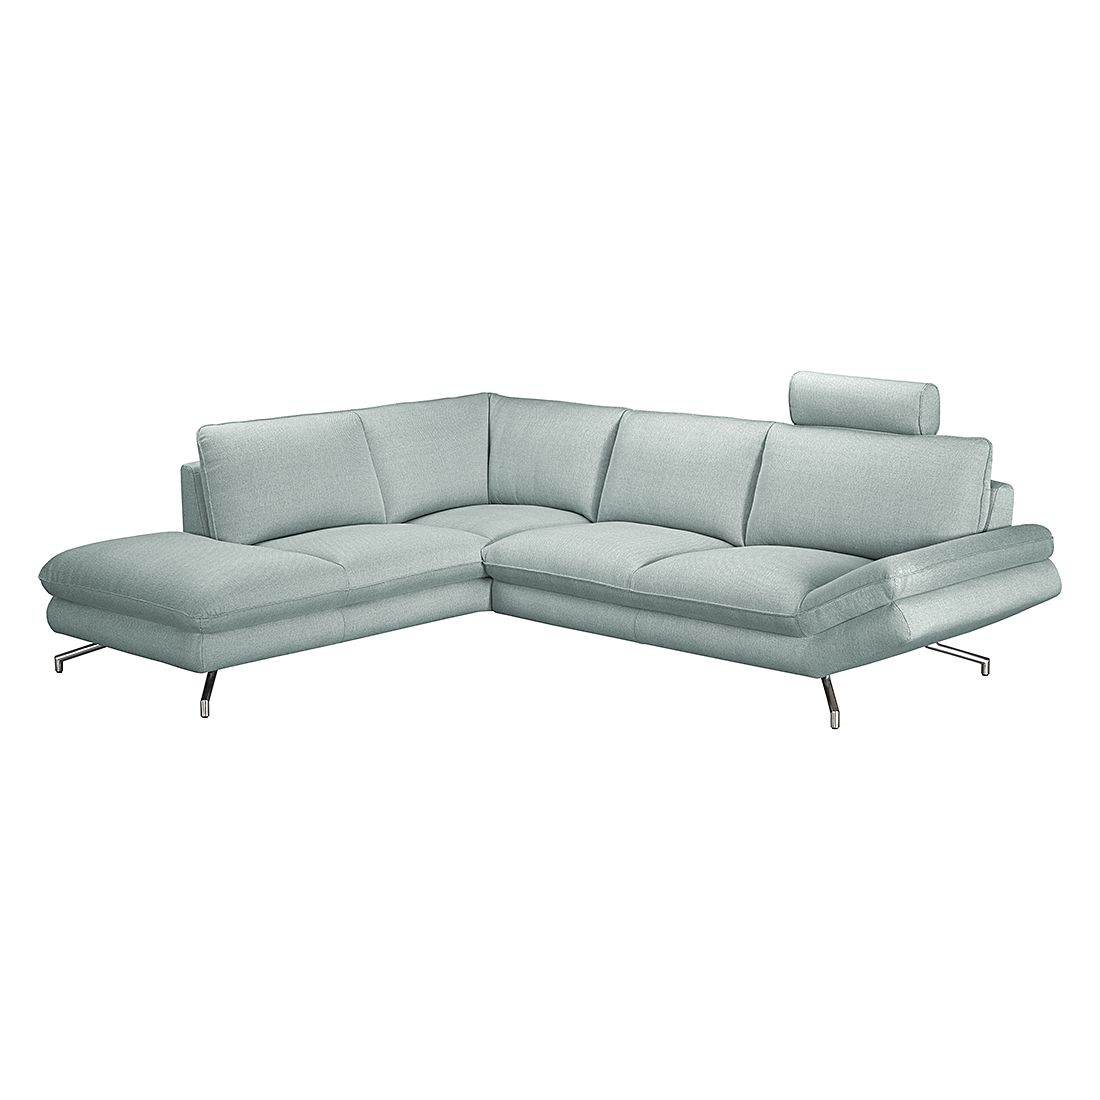 ecksofa sharon strukturstoff hellgrau ottomane. Black Bedroom Furniture Sets. Home Design Ideas